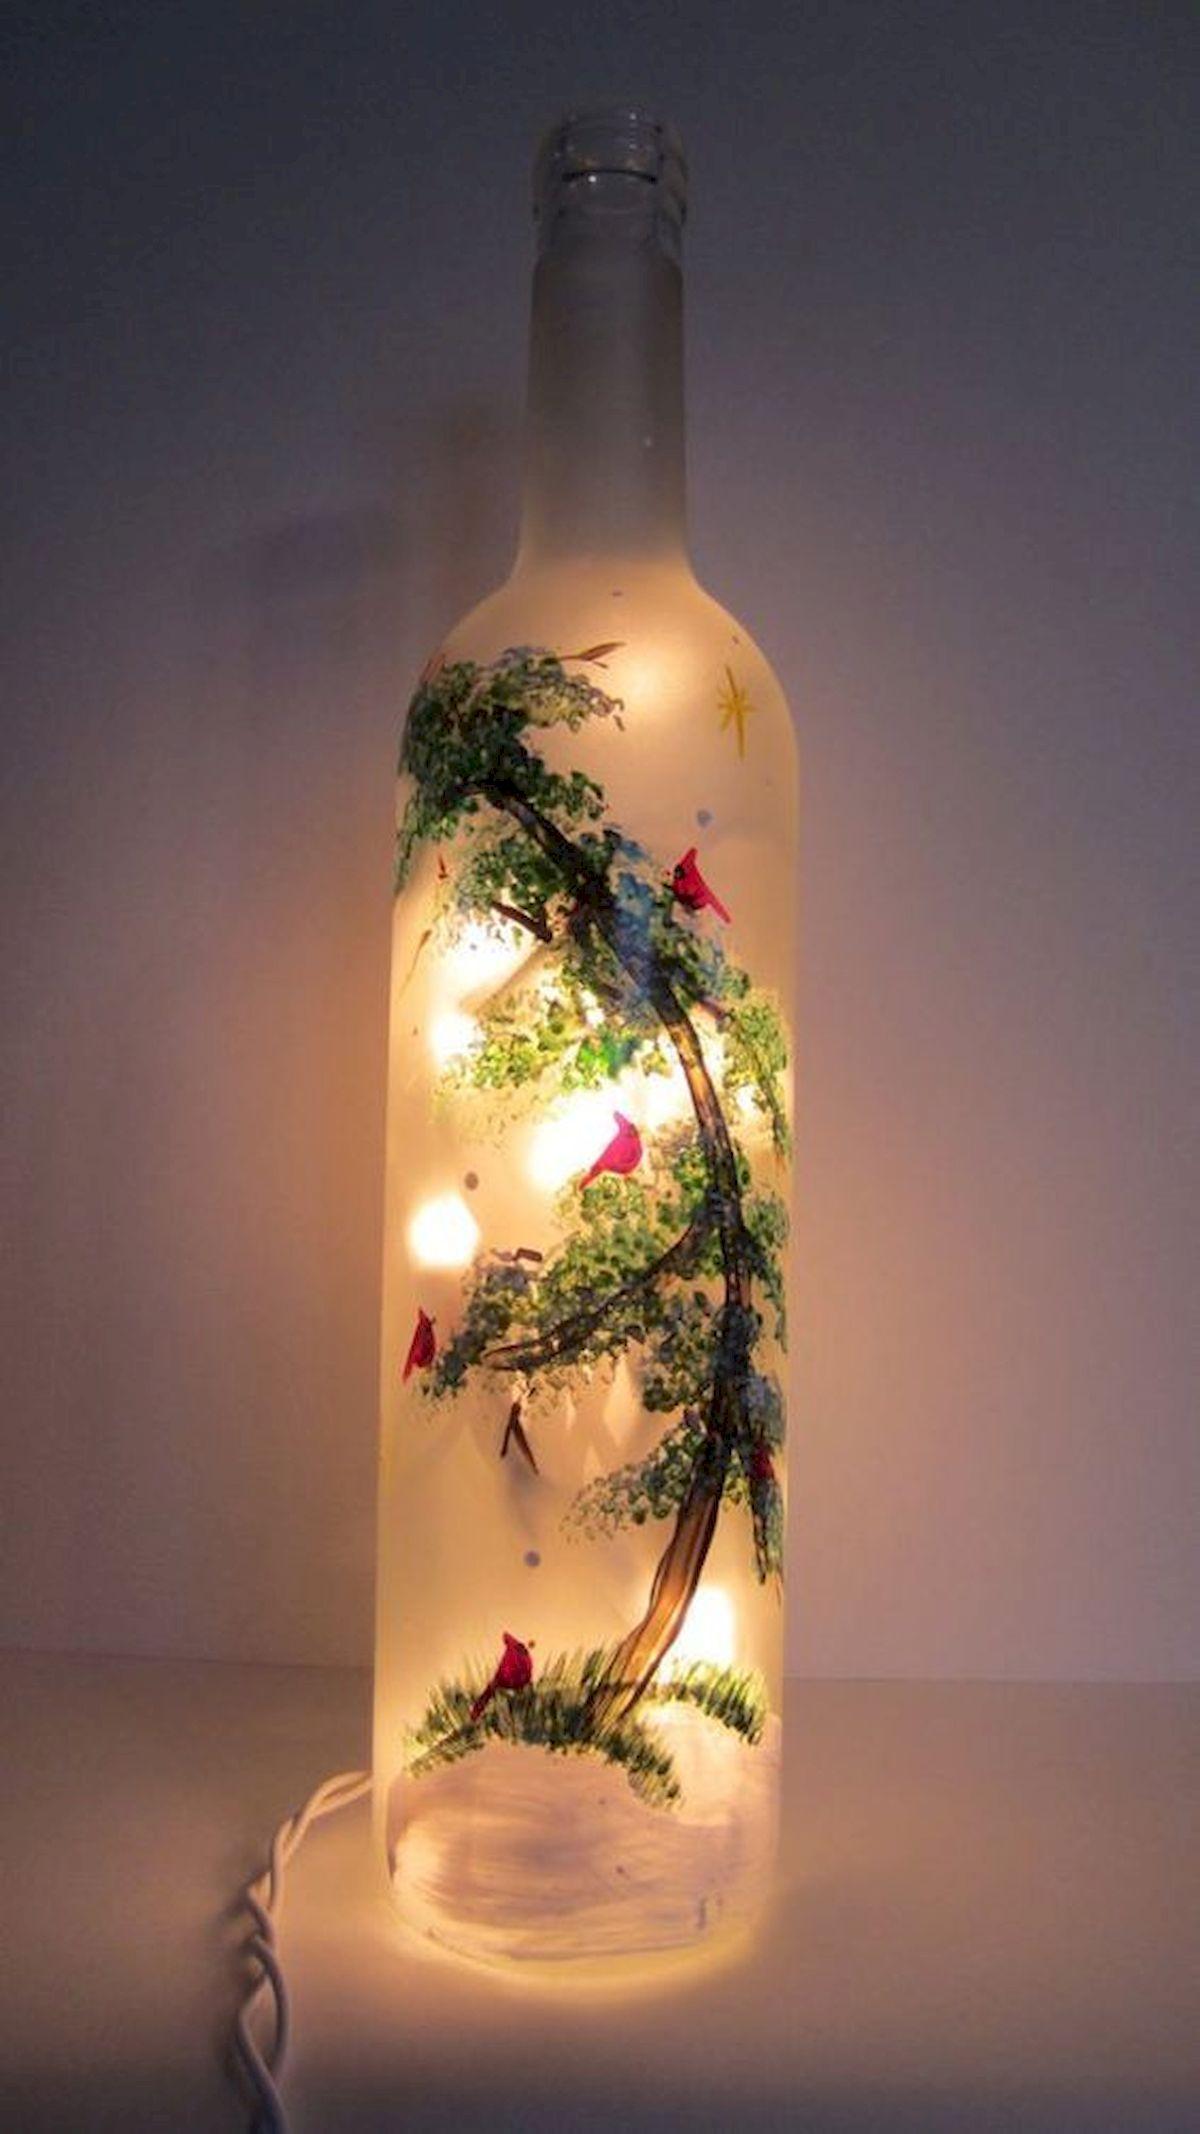 40 Fantastic DIY Wine Bottle Crafts Ideas With Lights (35)